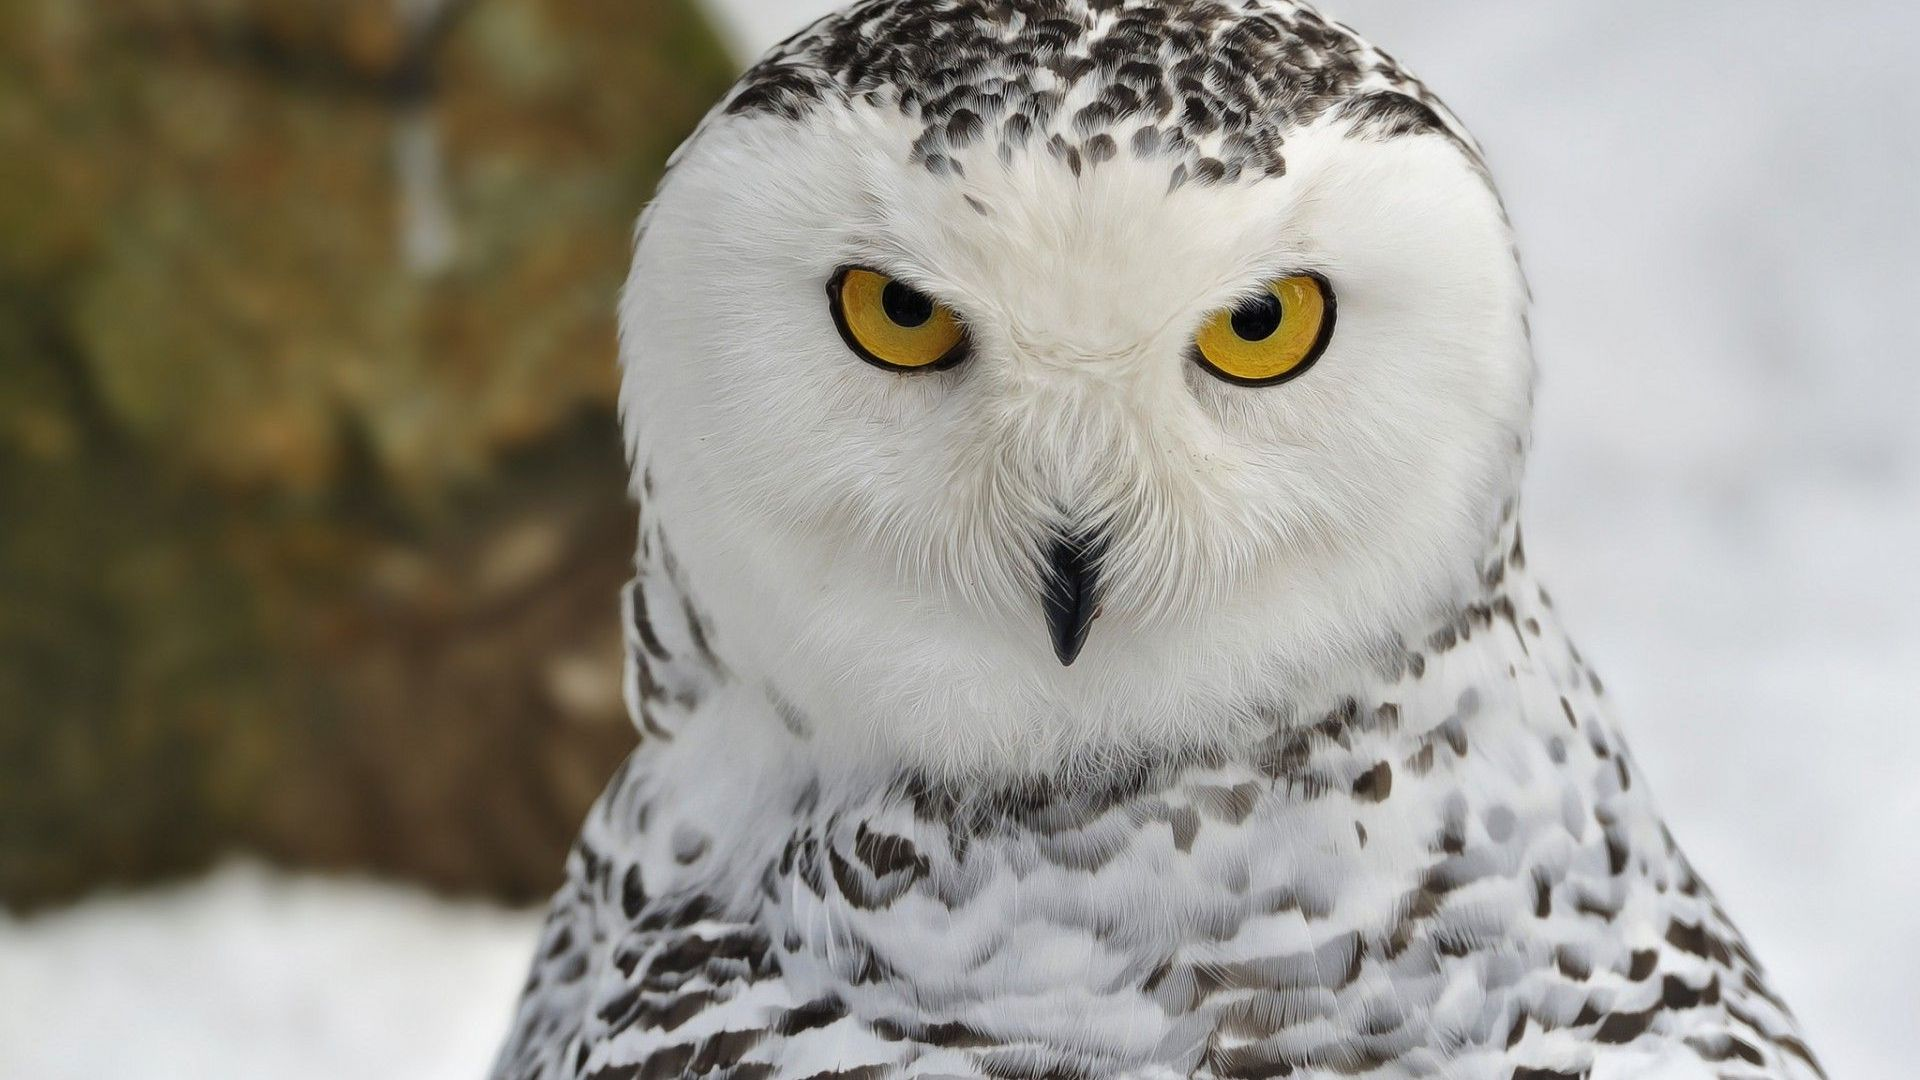 Snow owl Wallpaper 8552 1920x1080